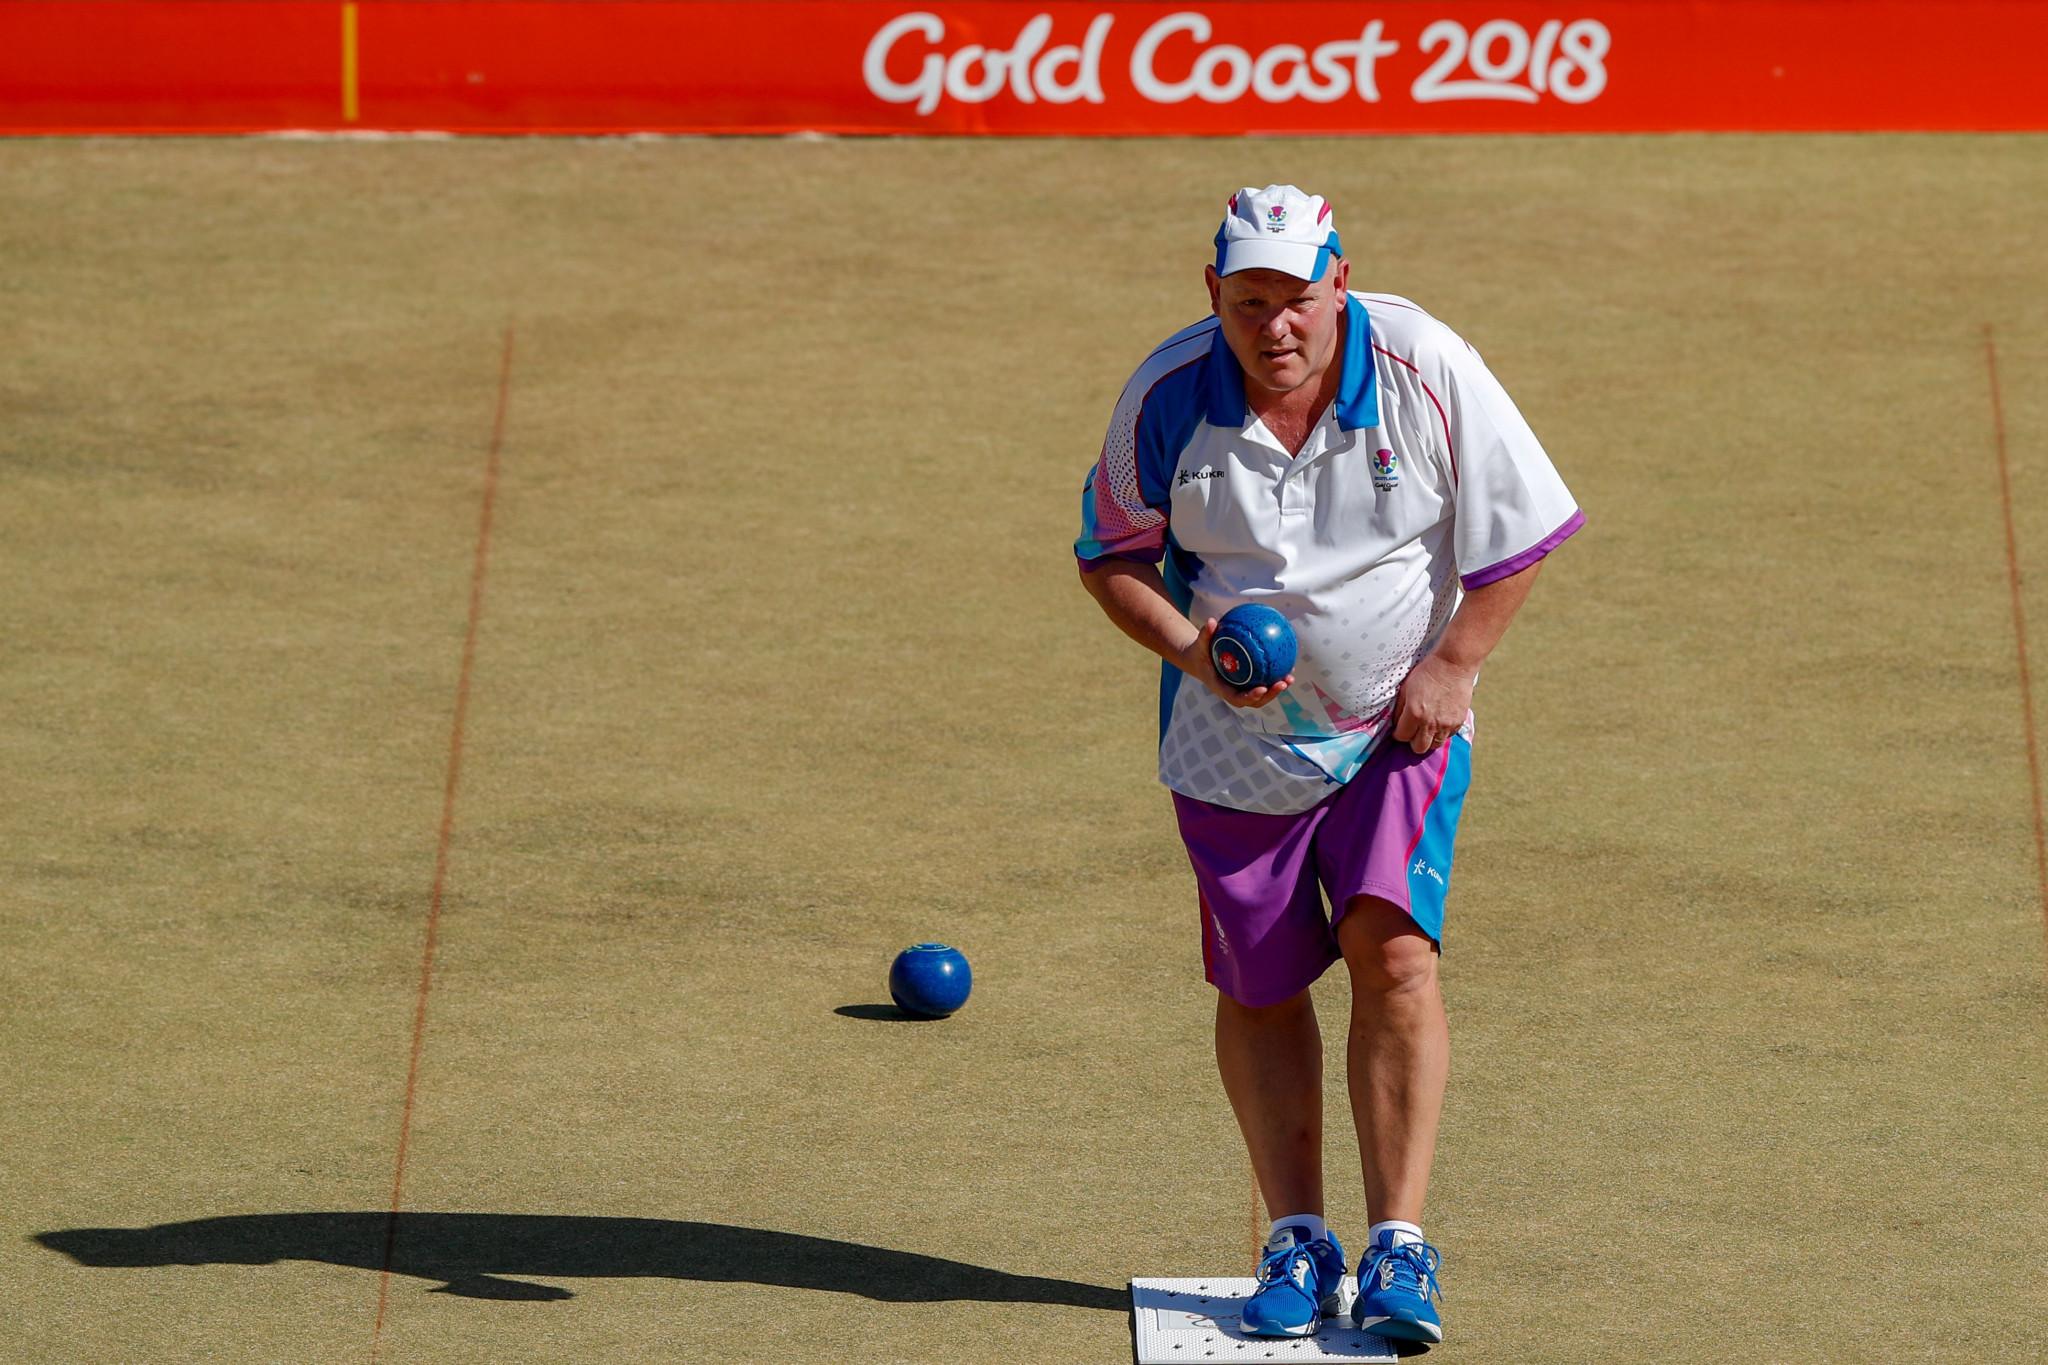 Marshall takes fifth Commonwealth Games lawn bowls gold as Scotland stun Australia